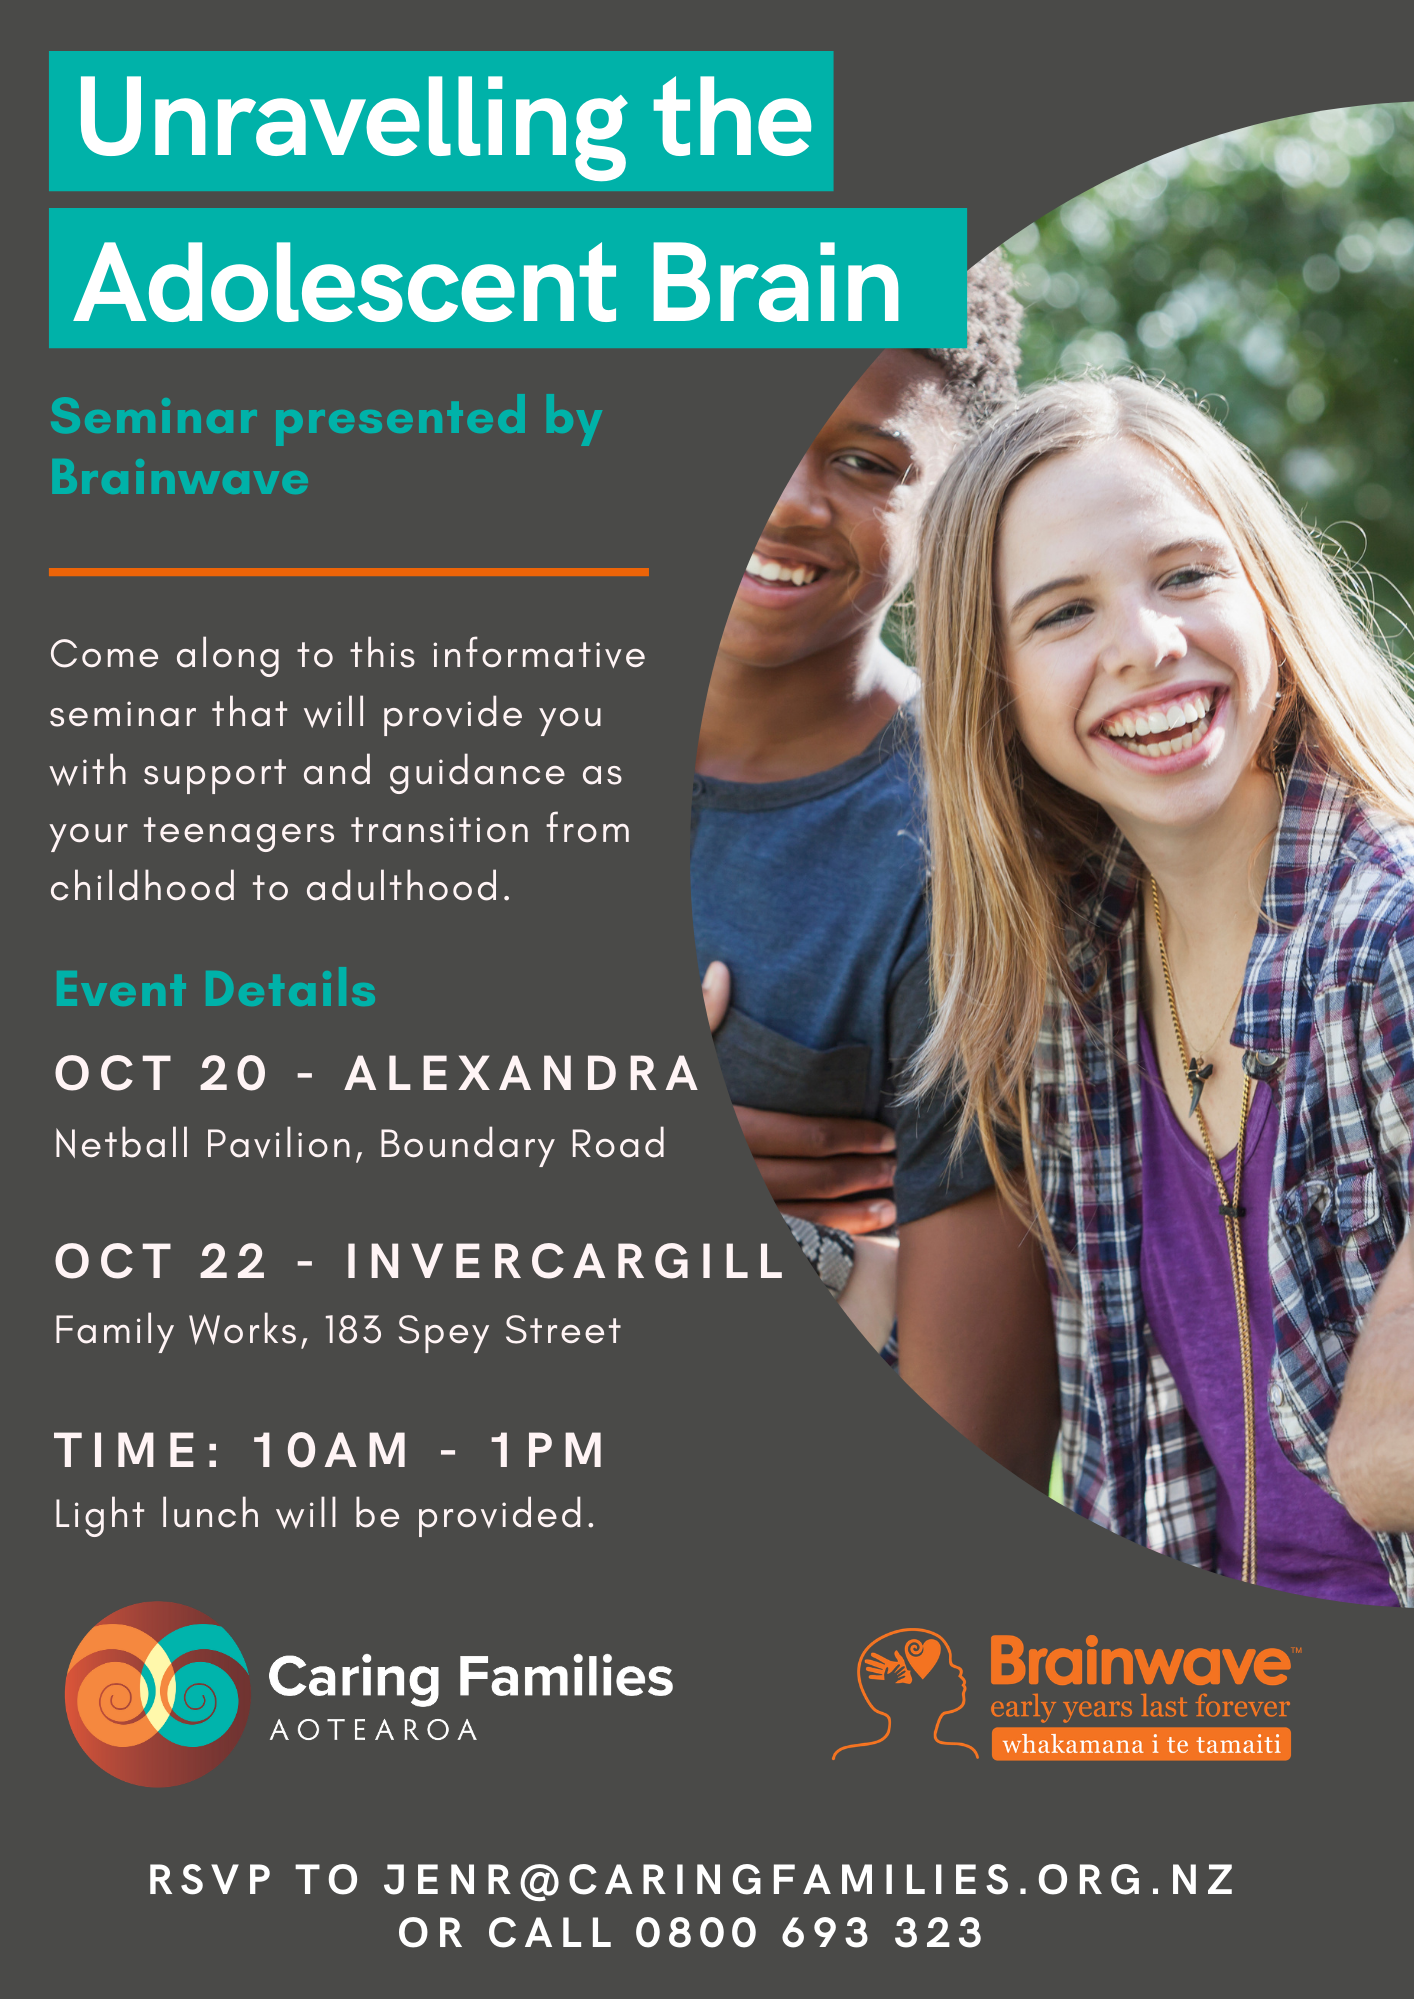 Unravelling the Adolescent Brain